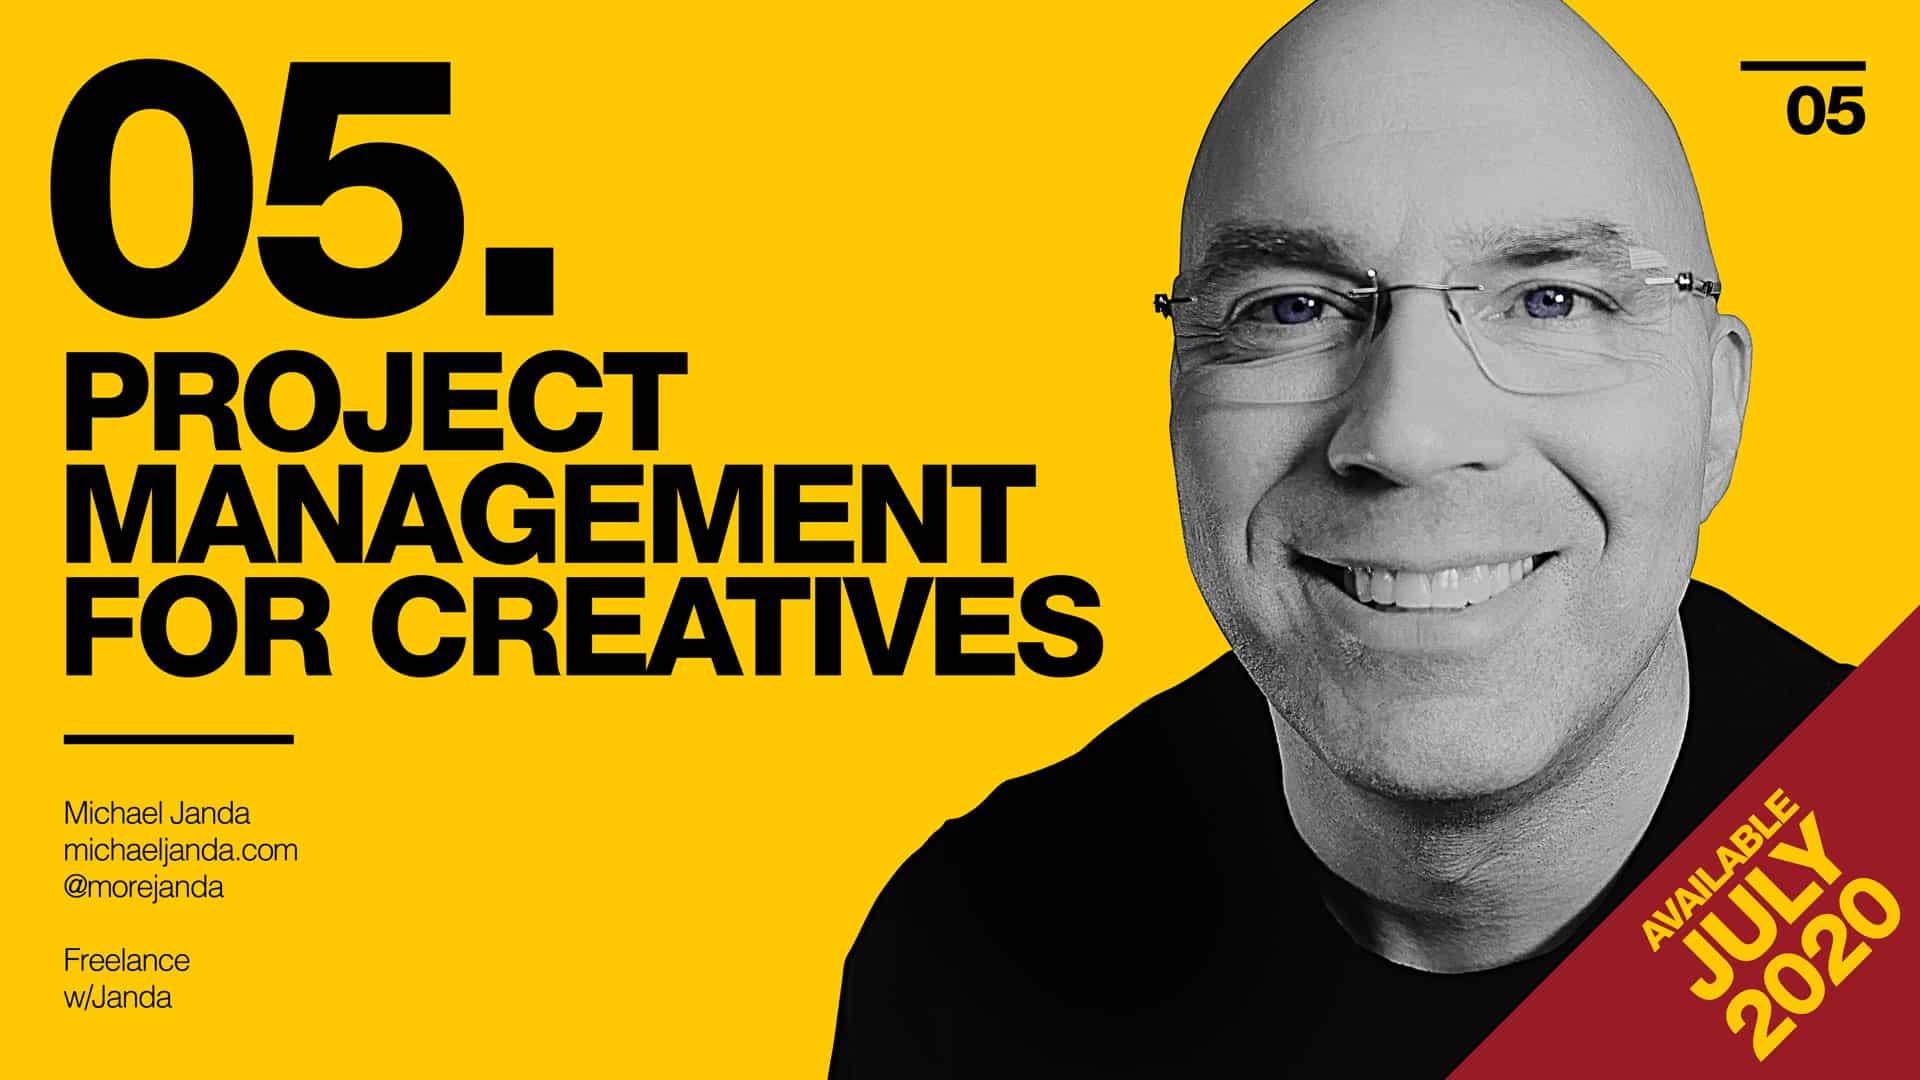 Freelance with Janda - Project Management